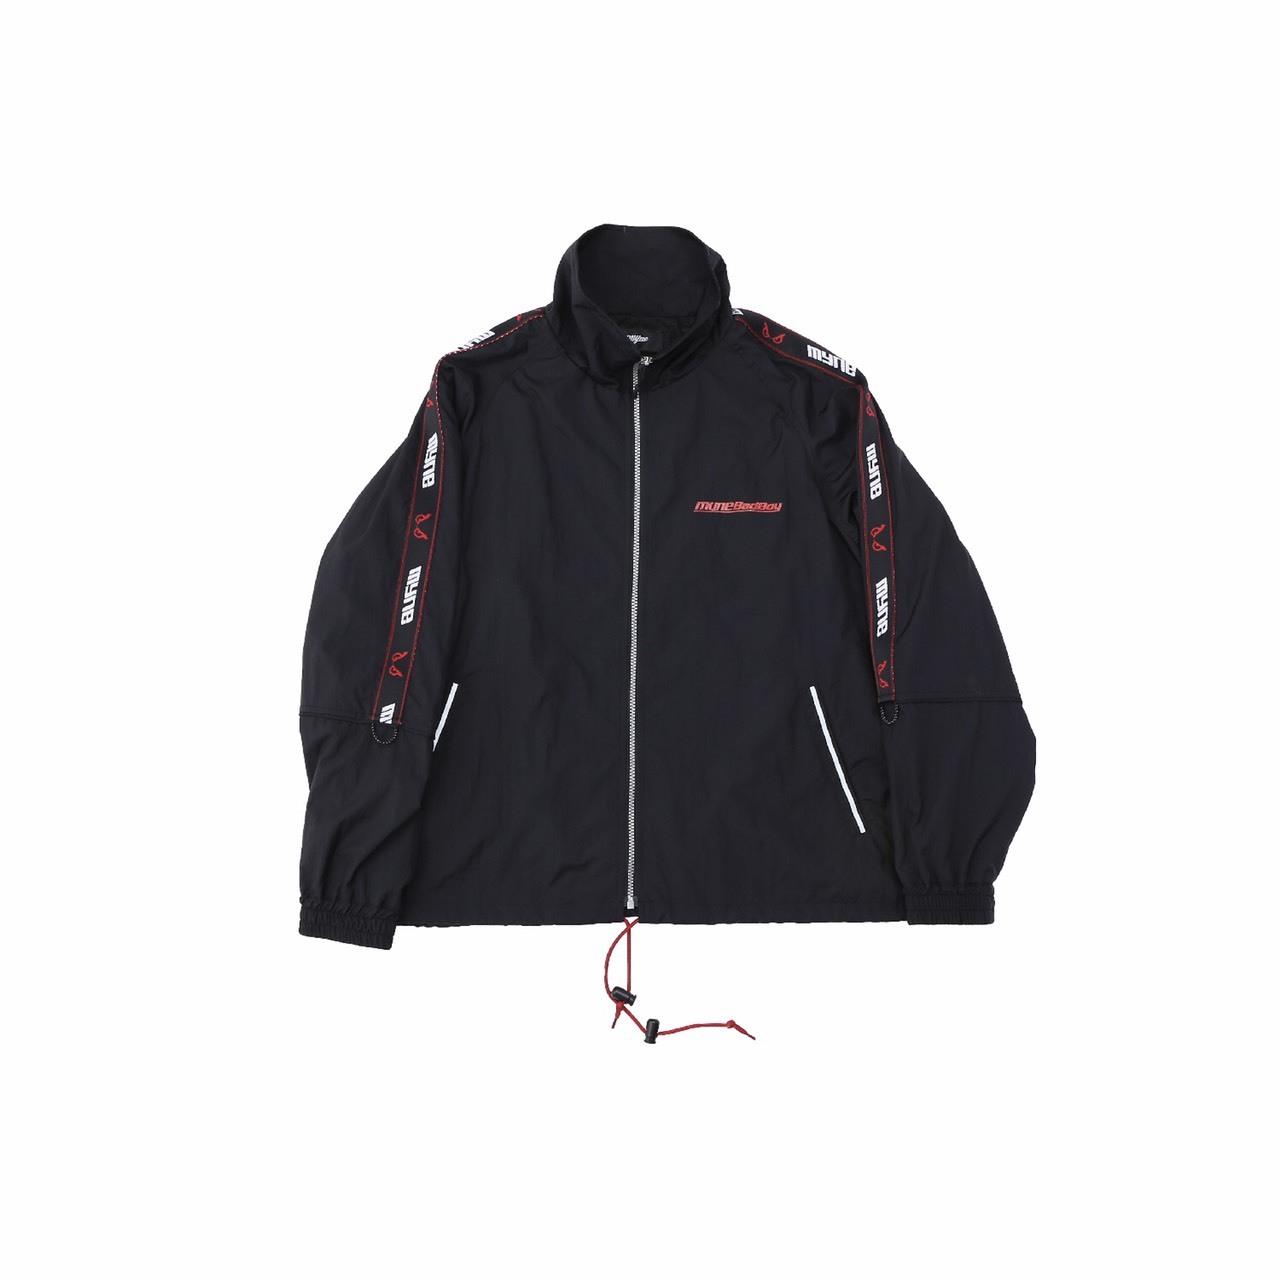 MYne × BADBOY Track jacket / BLACK - 画像1